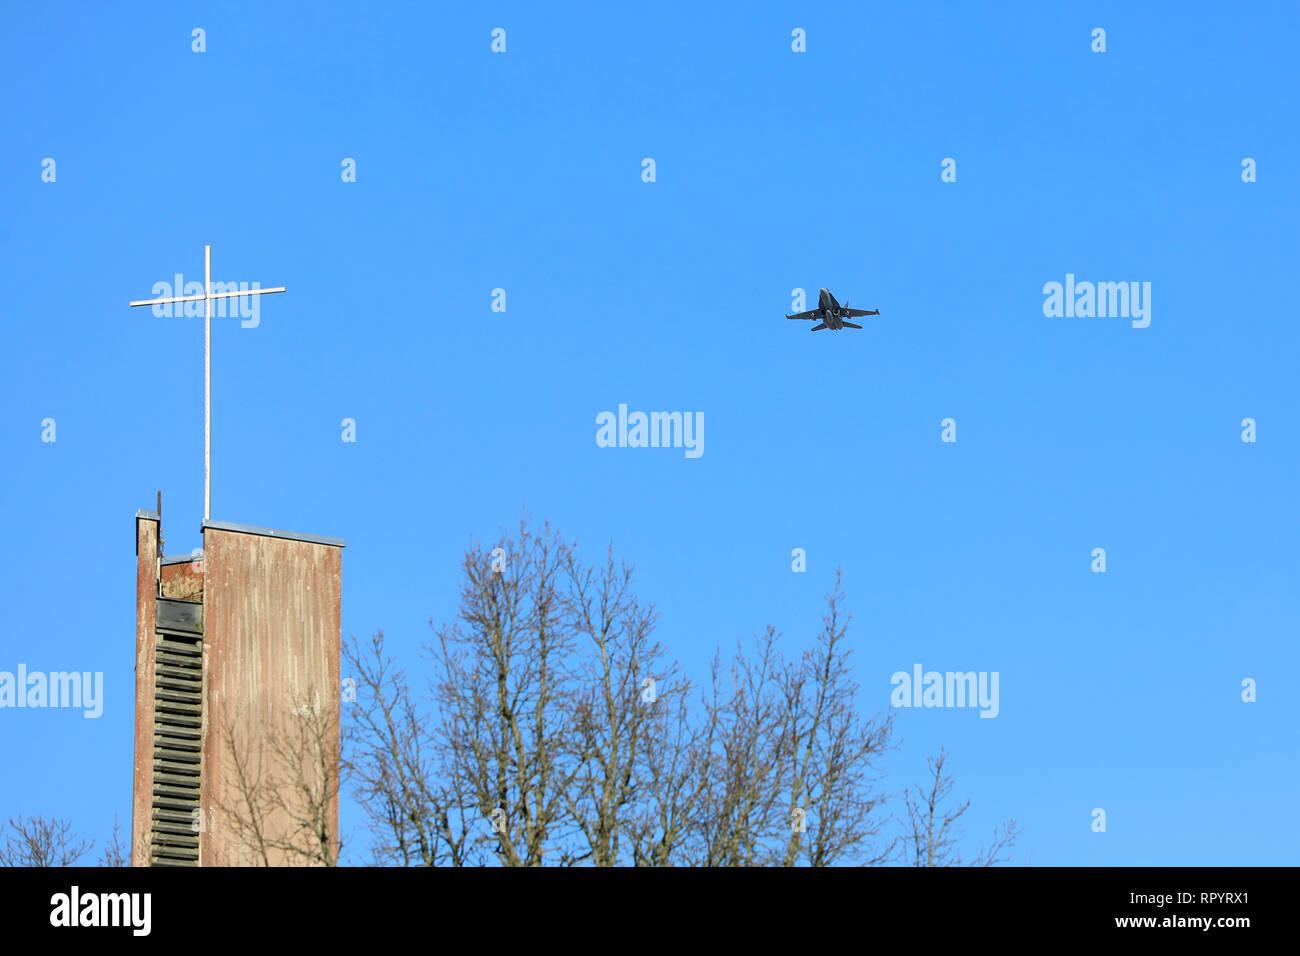 Salo, Finland .February 23, 2019: Finnish Air Force combat jet McDonnell Douglas F/A-18 Hornet flyover Helisnummi Cemetery Chapel in honor of Salo War Veteran, fighter pilot Martti Lehtovaara, deceased at 98. Image credit: Taina Sohlman/Alamy Live News Stock Photo